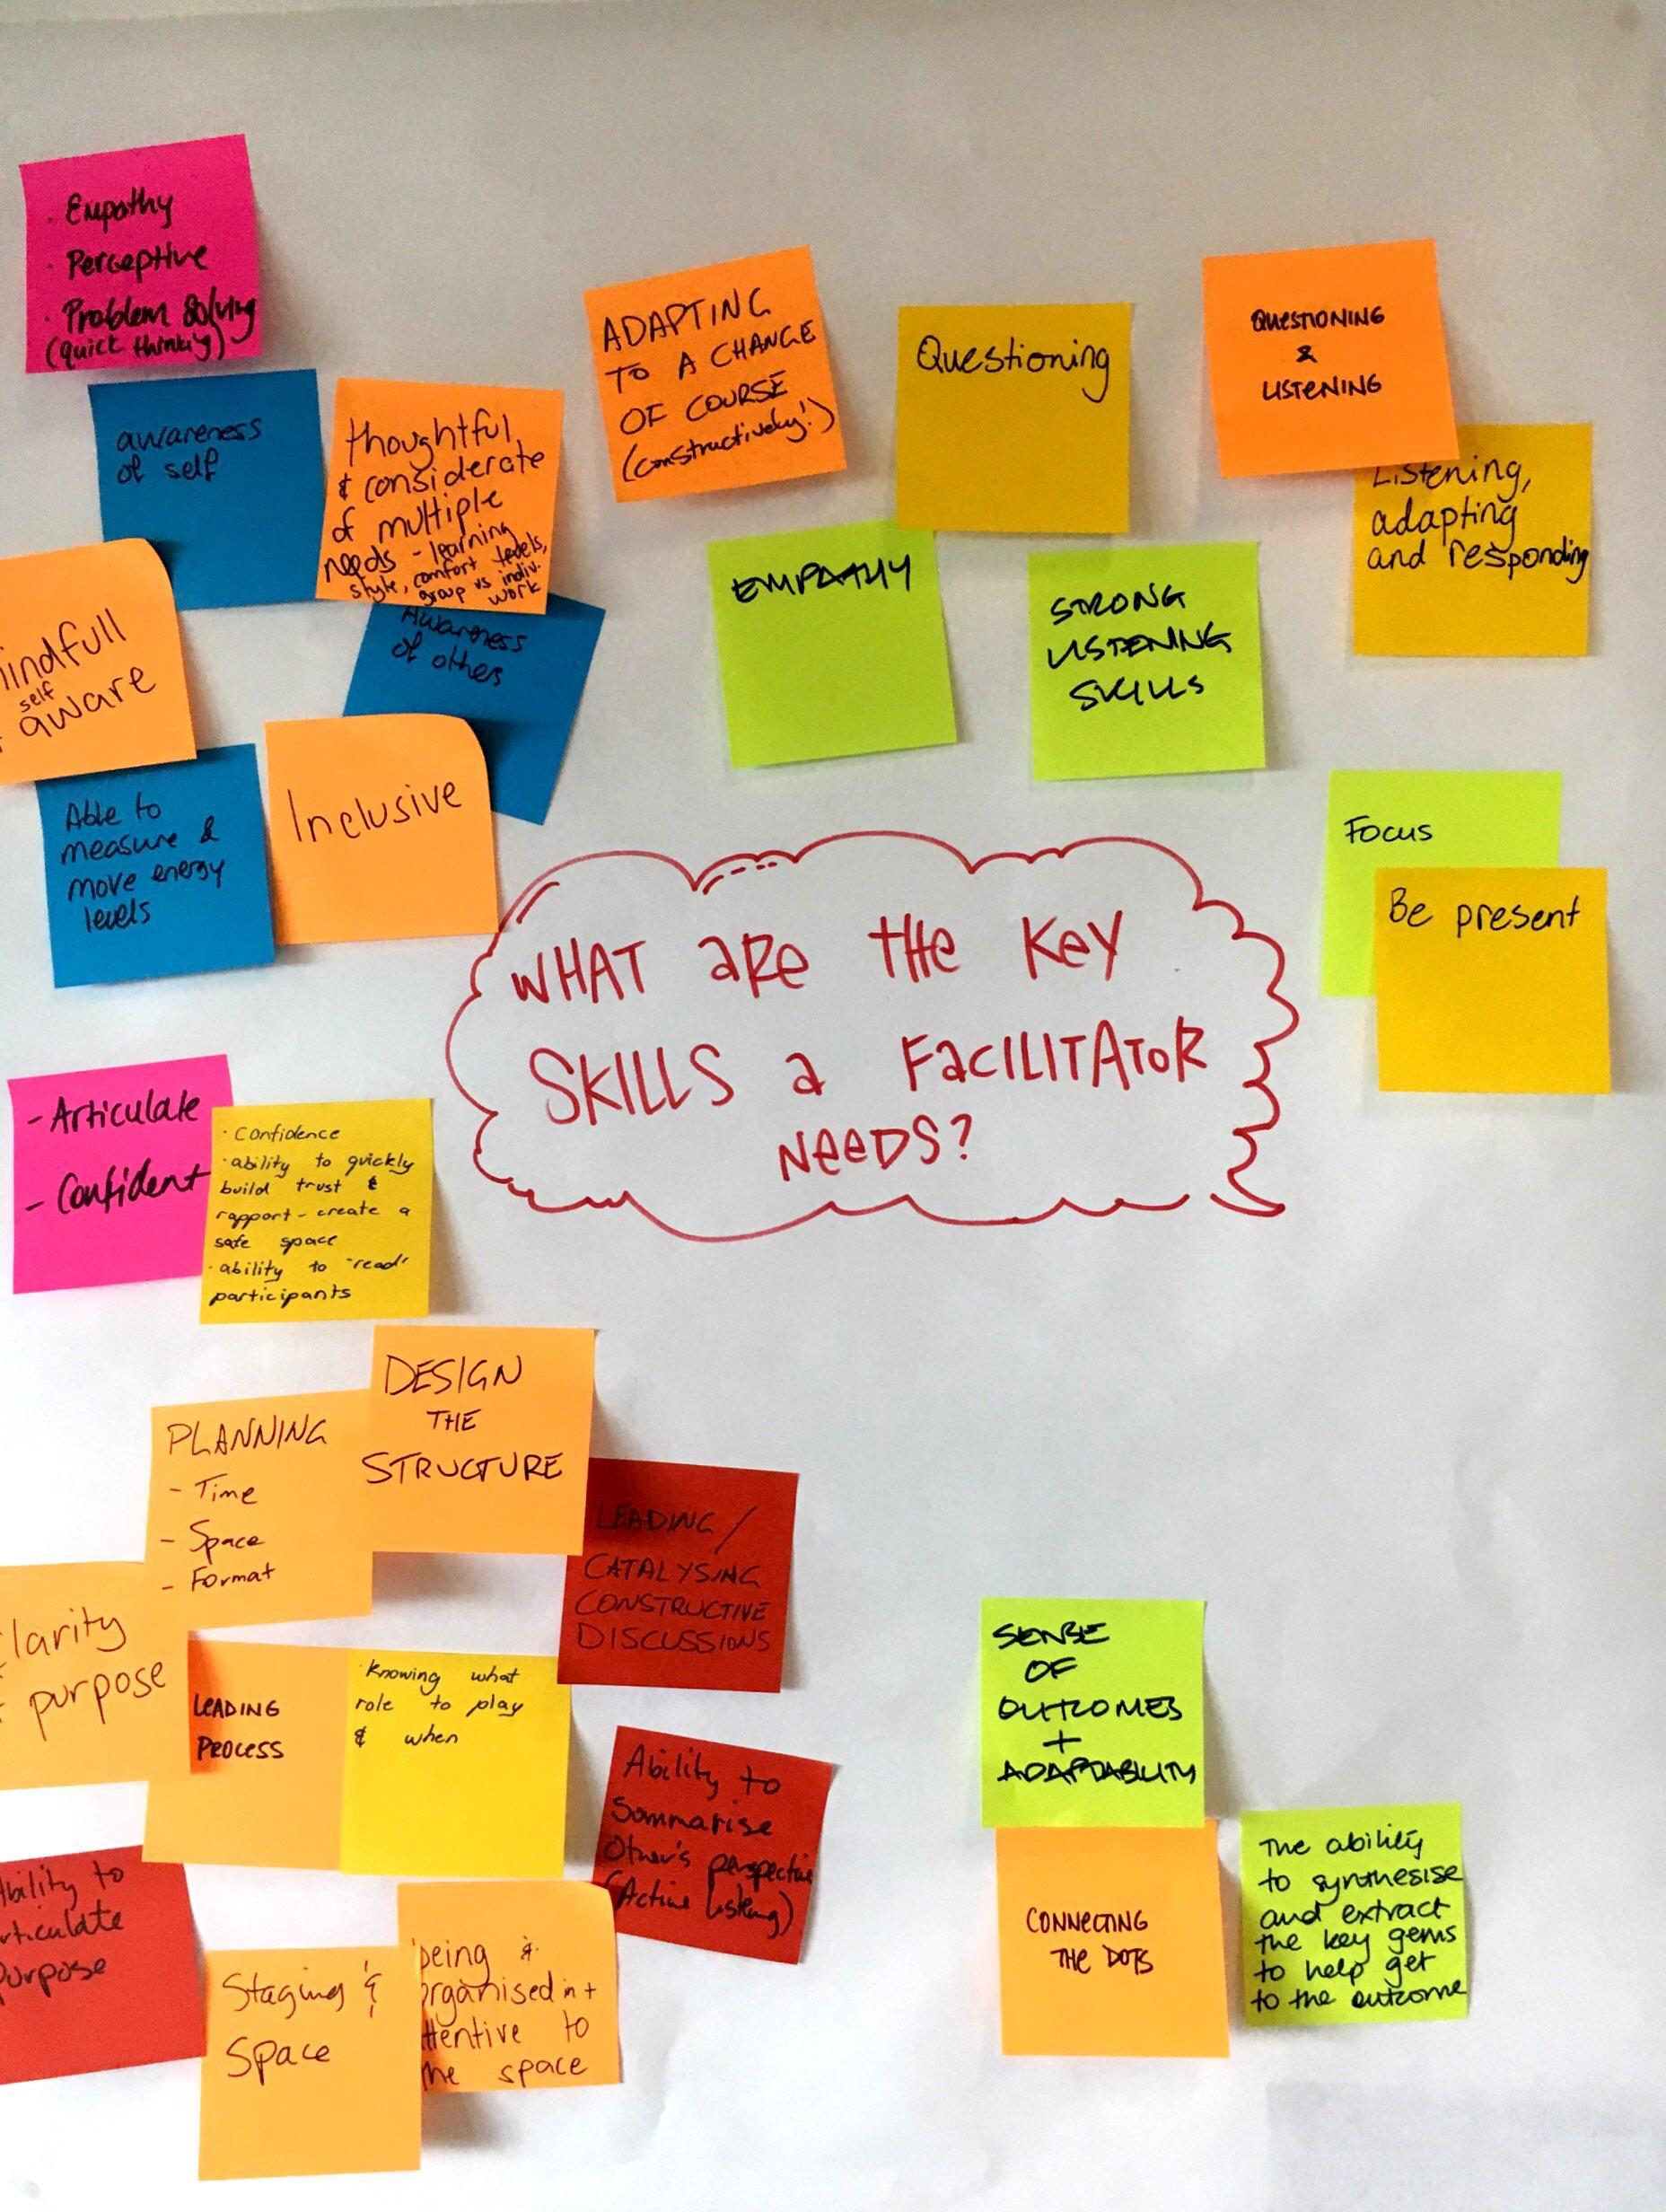 Key skills of the Facilitator?